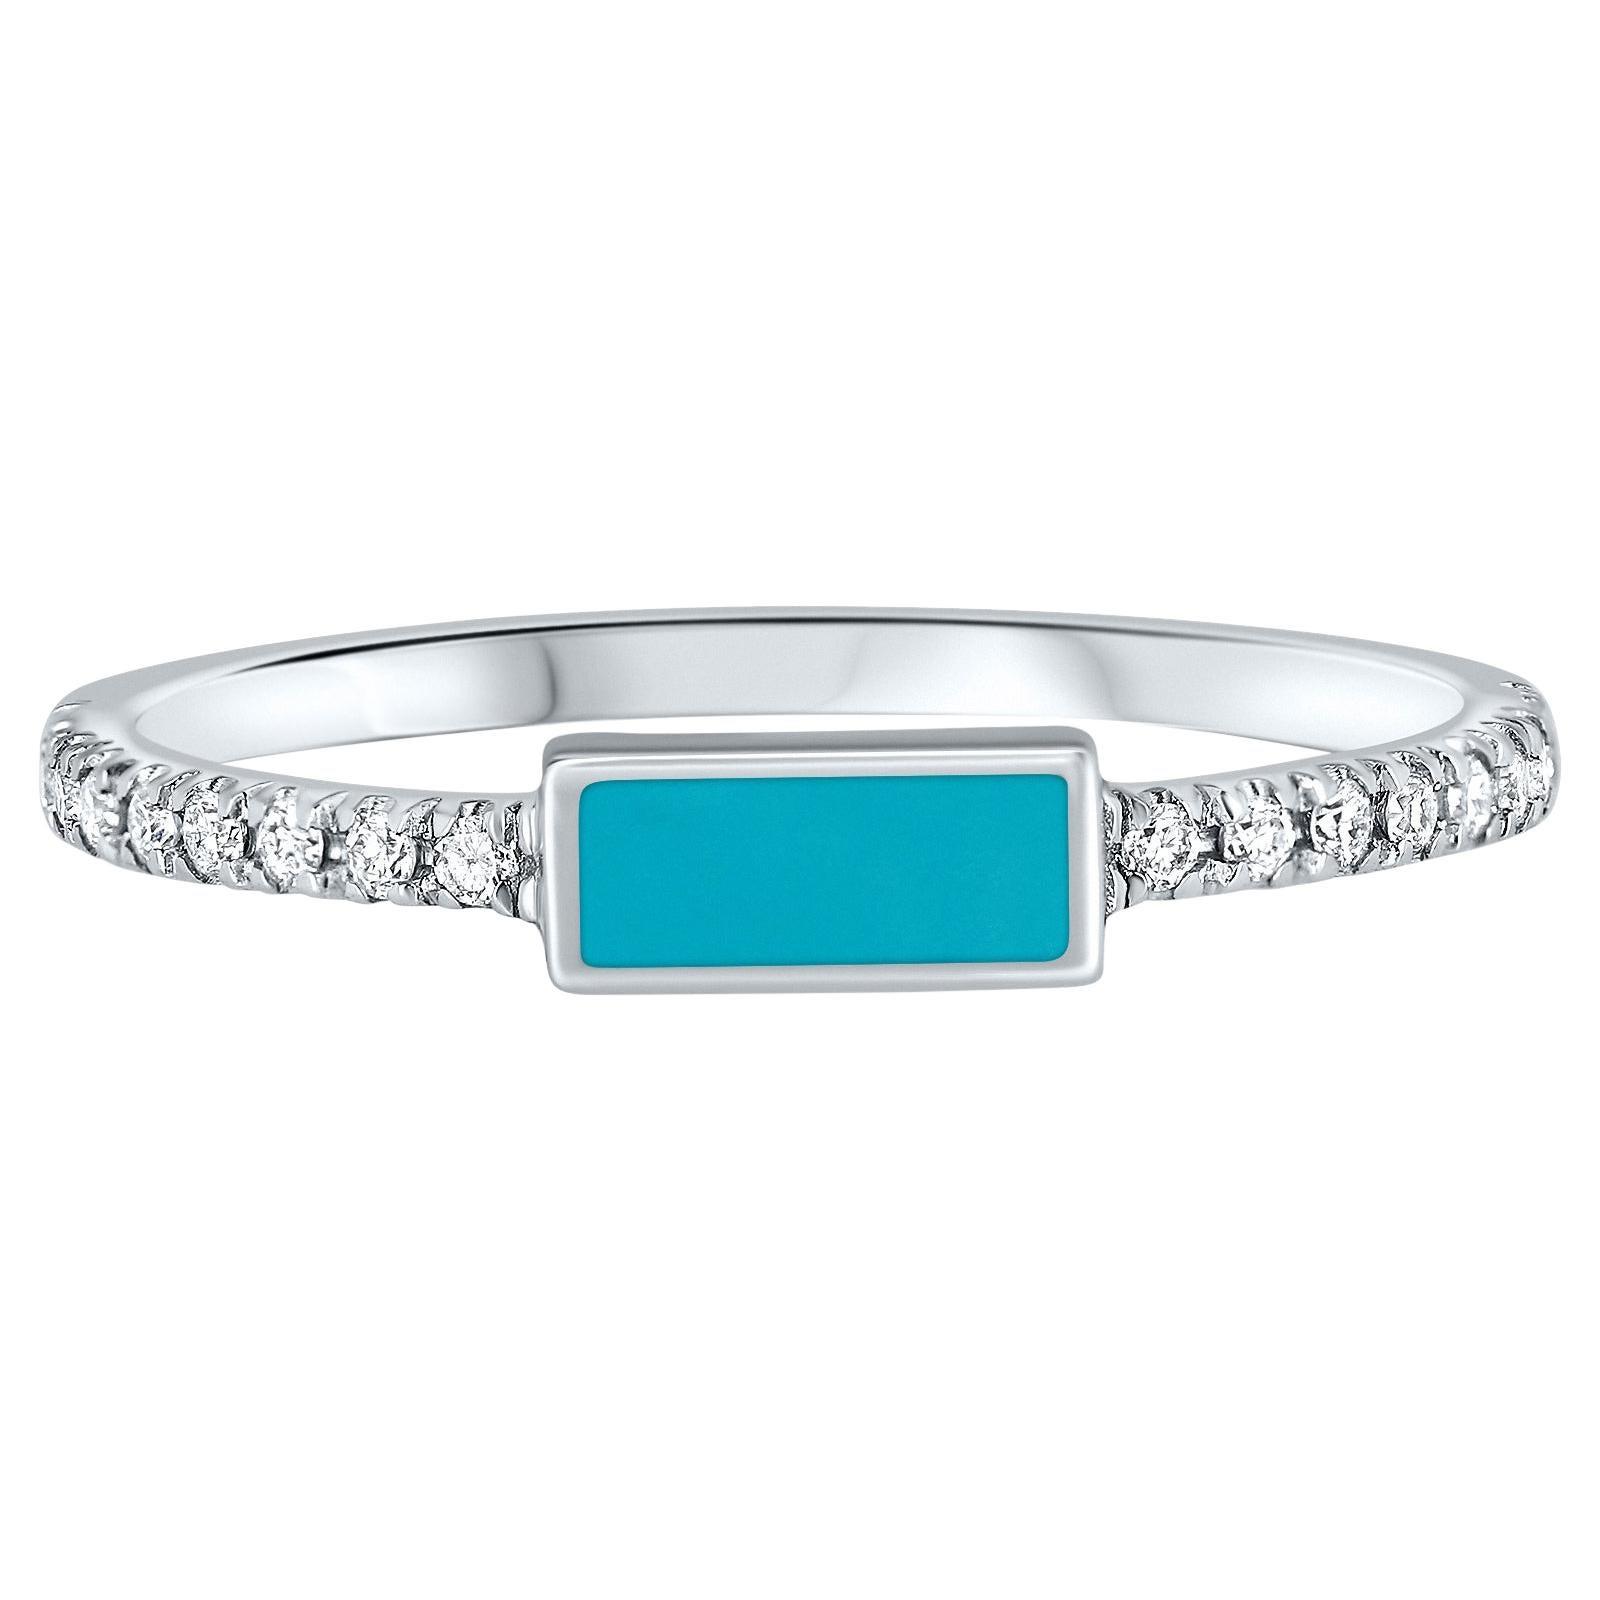 14K White Gold Pave Diamond Turquoise Enamel Rectangle Ring, Shlomit Rogel